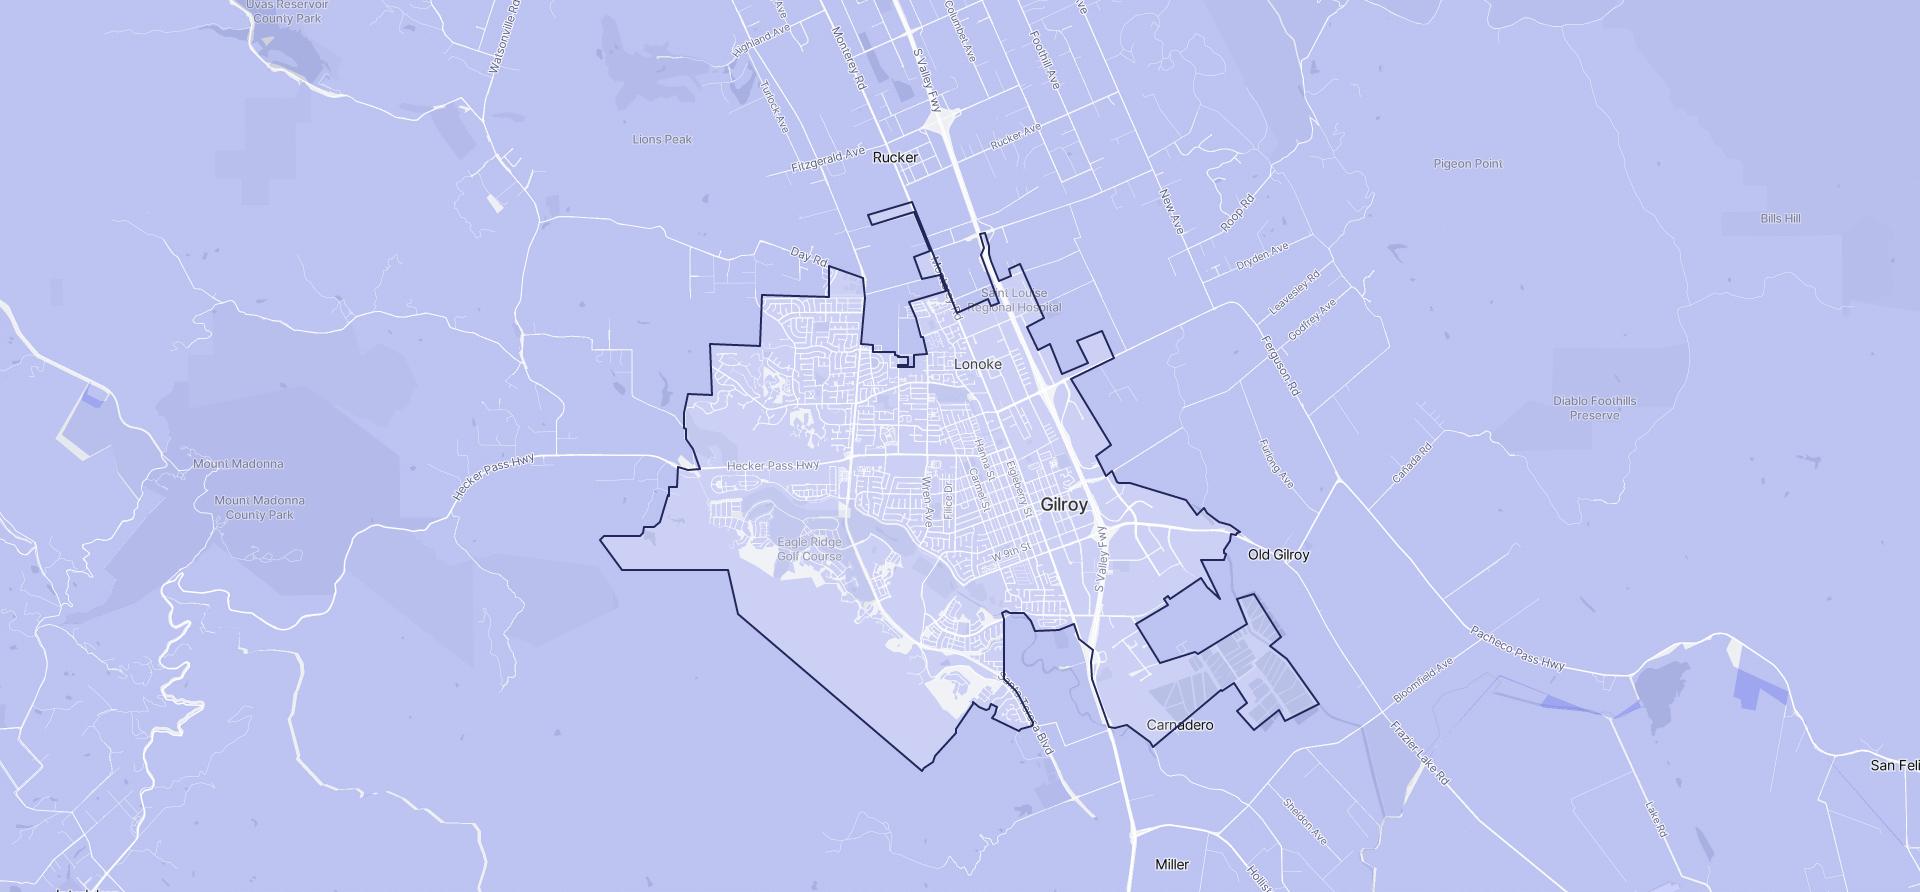 Image of Gilroy boundaries on a map.